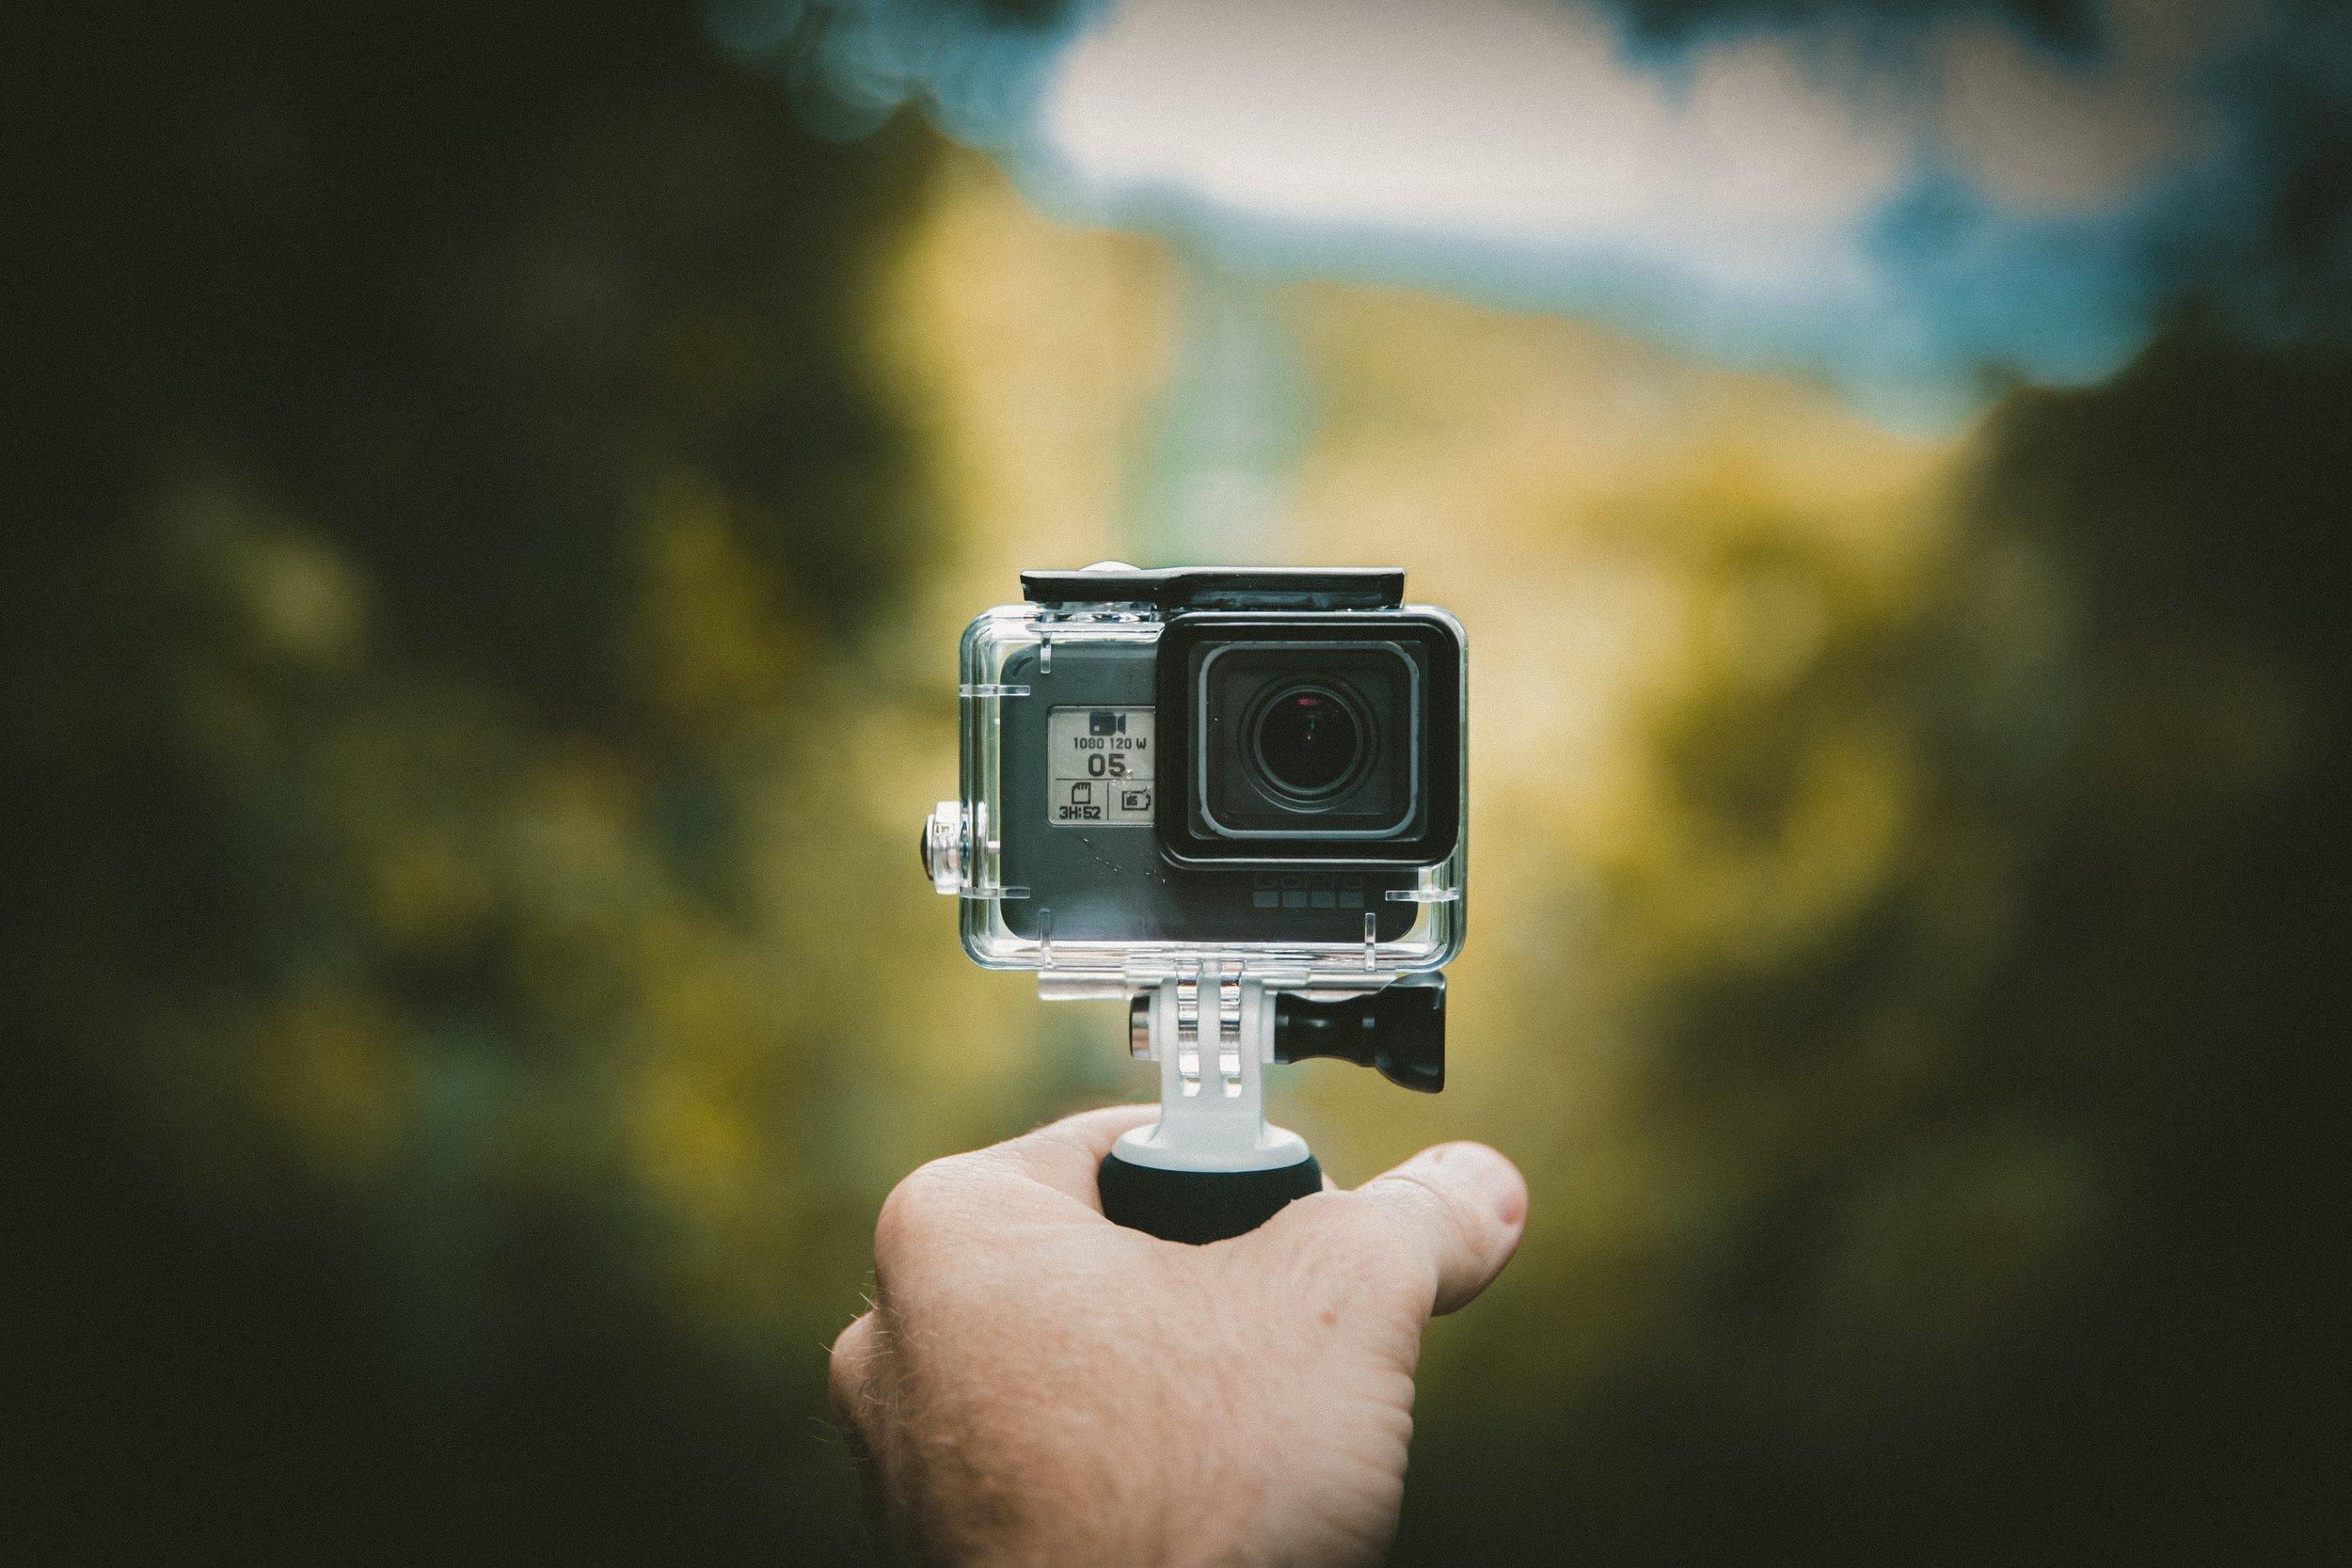 travel gear camera